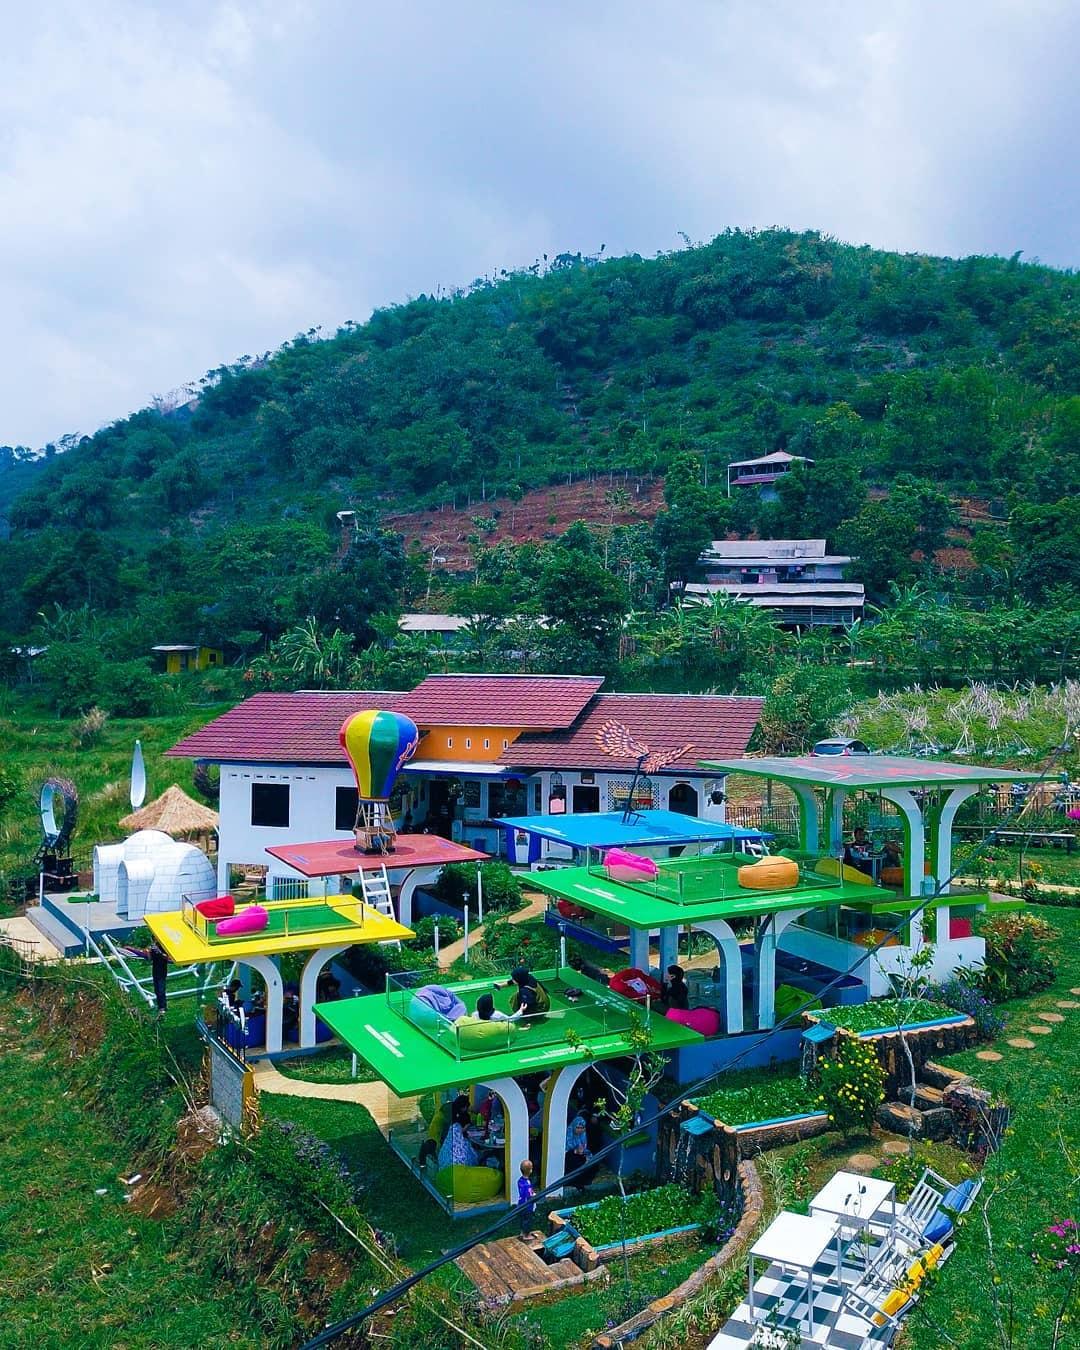 Mendaki Kopi Cafe Gunung Salak Bogor